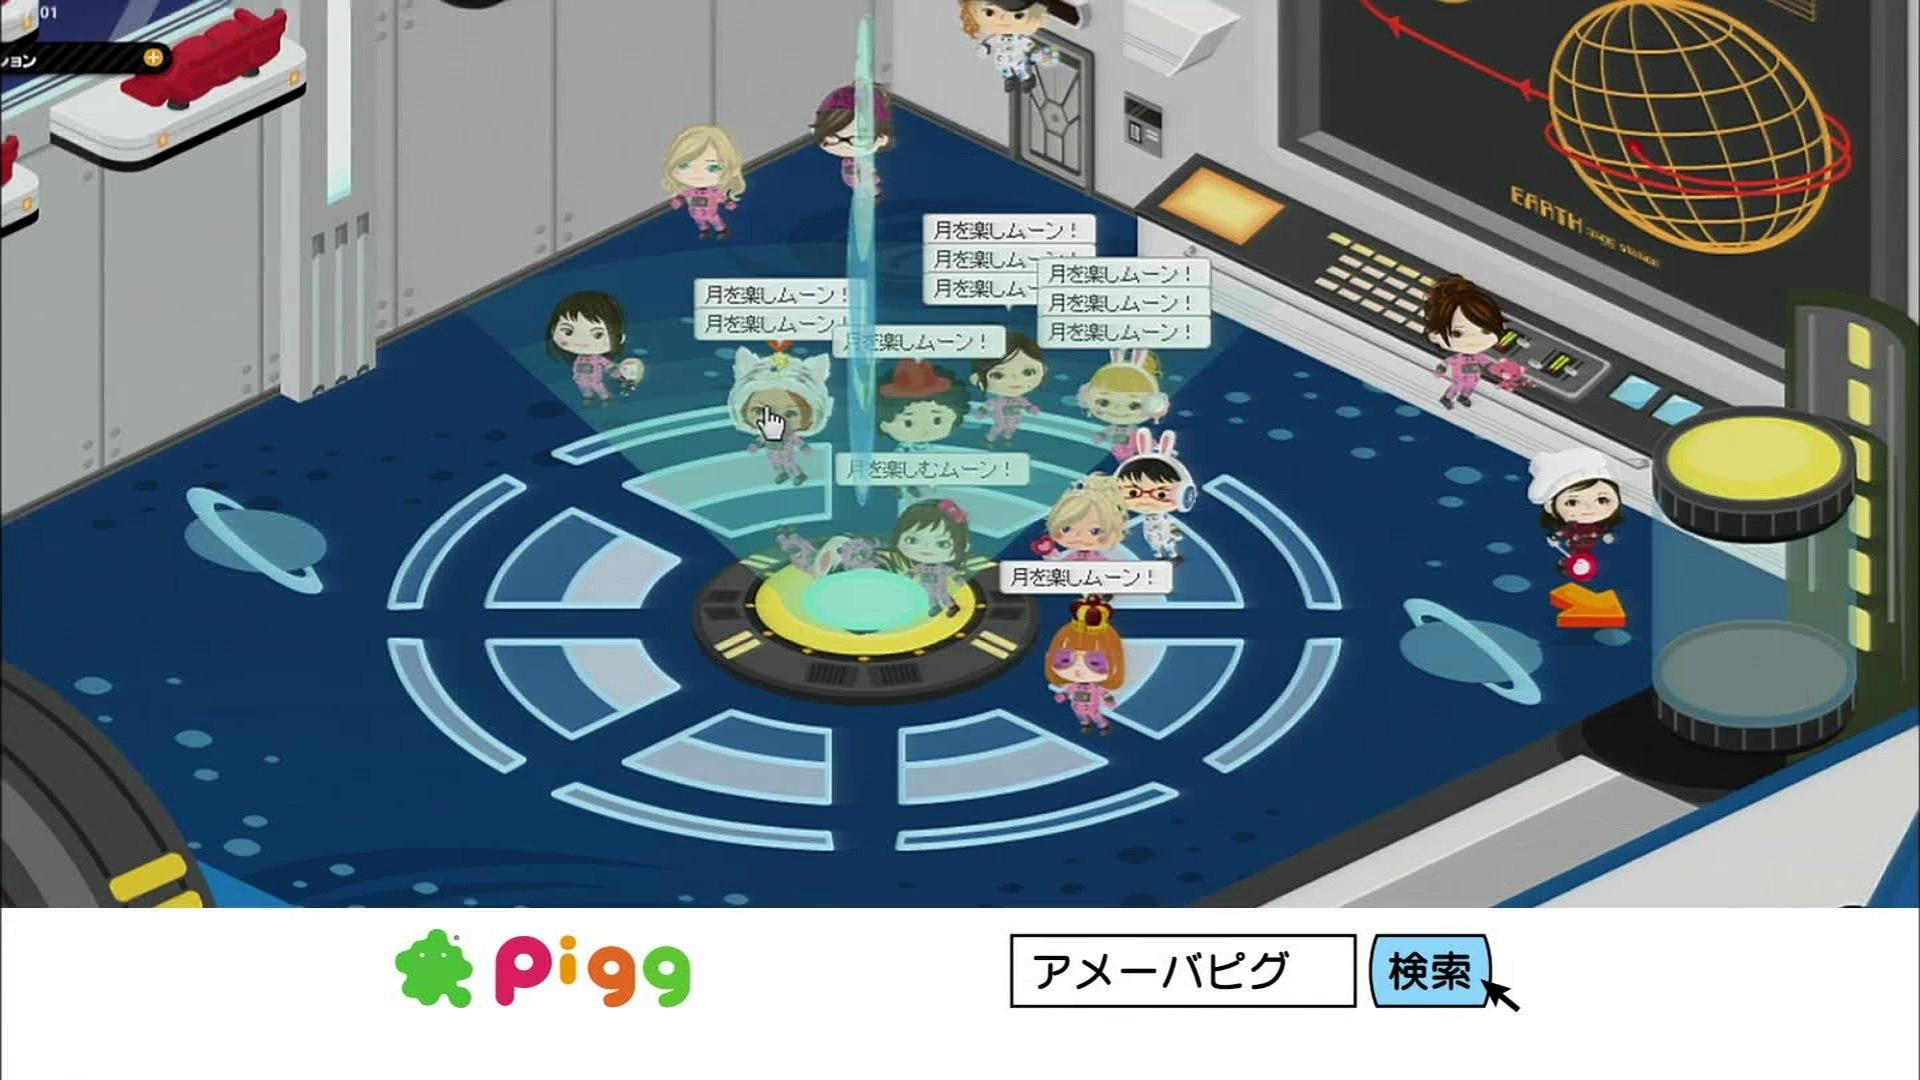 00515 cyberagent ameba pigg keiko mayama computers video games - Komasharu - Japanese Commercial